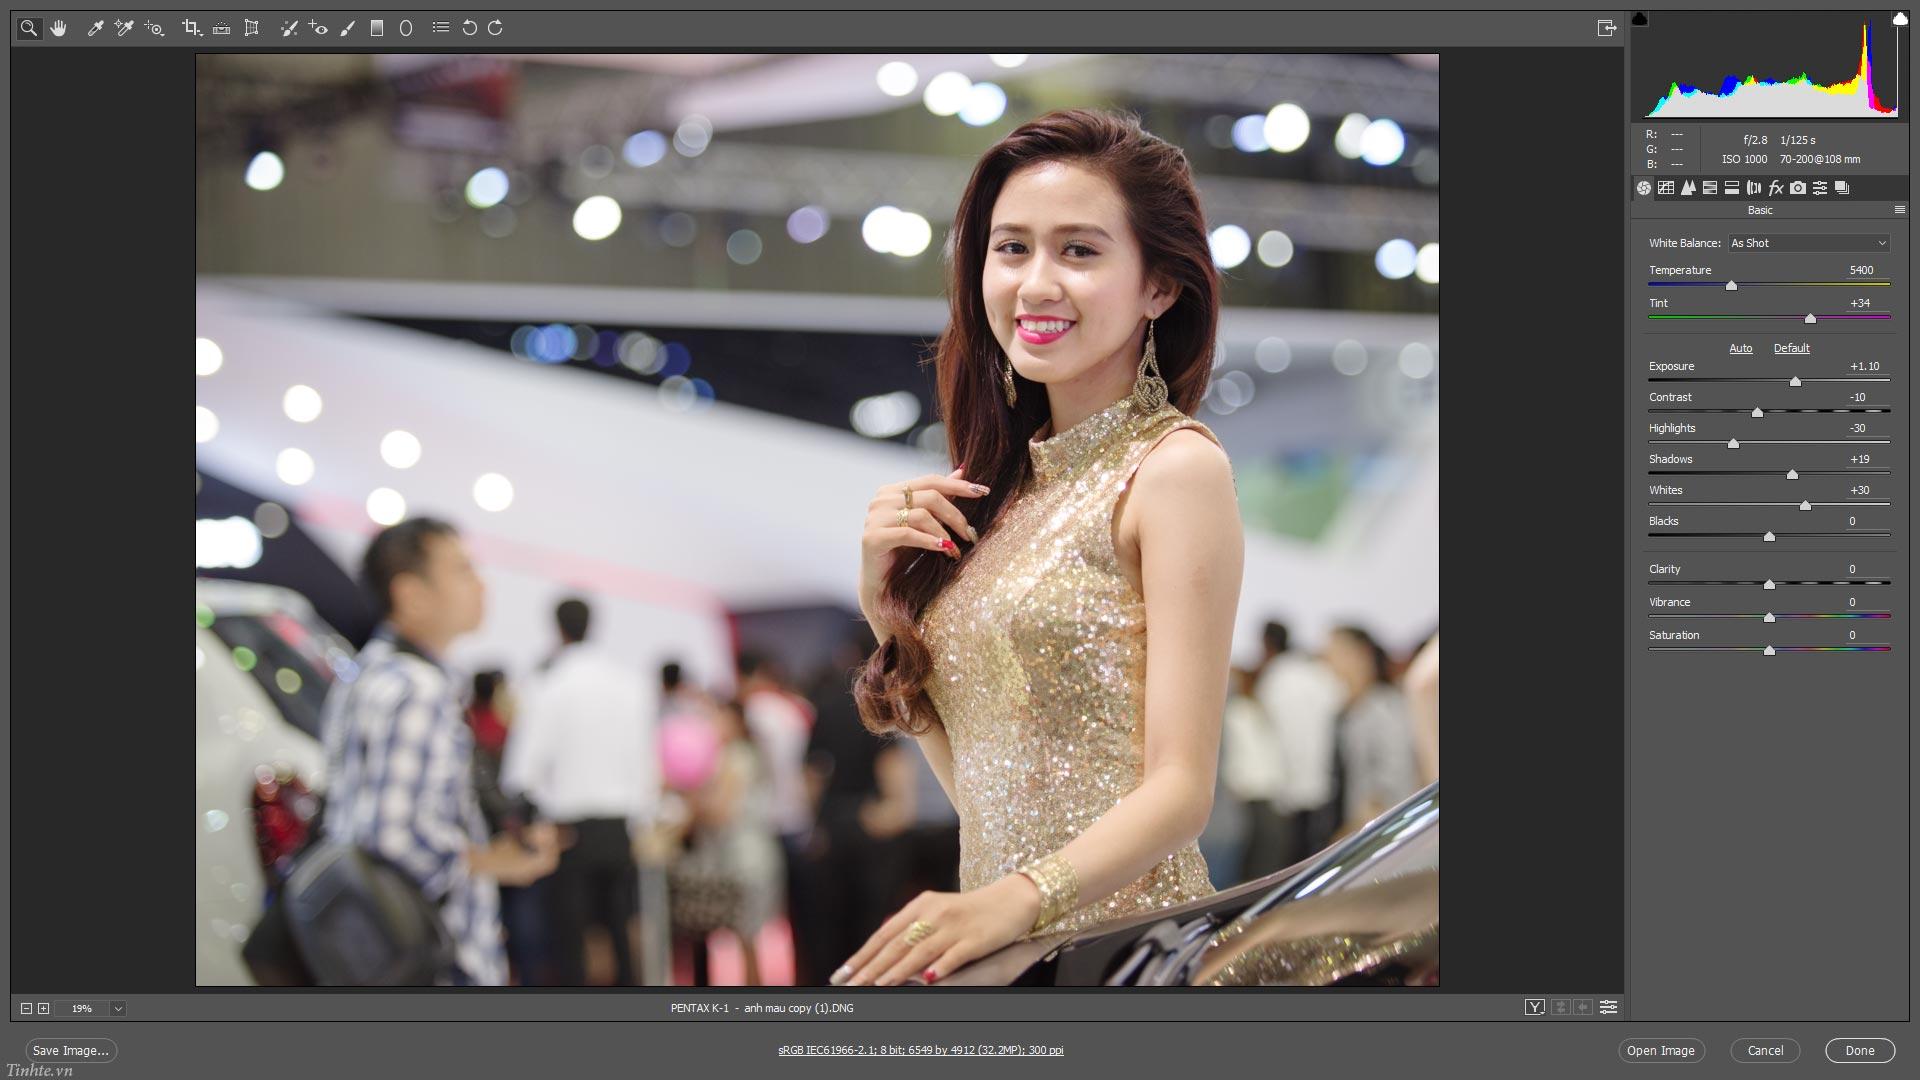 Lam_anh_sang_ro_trong_treo_hon_tinhte.vn.jpg